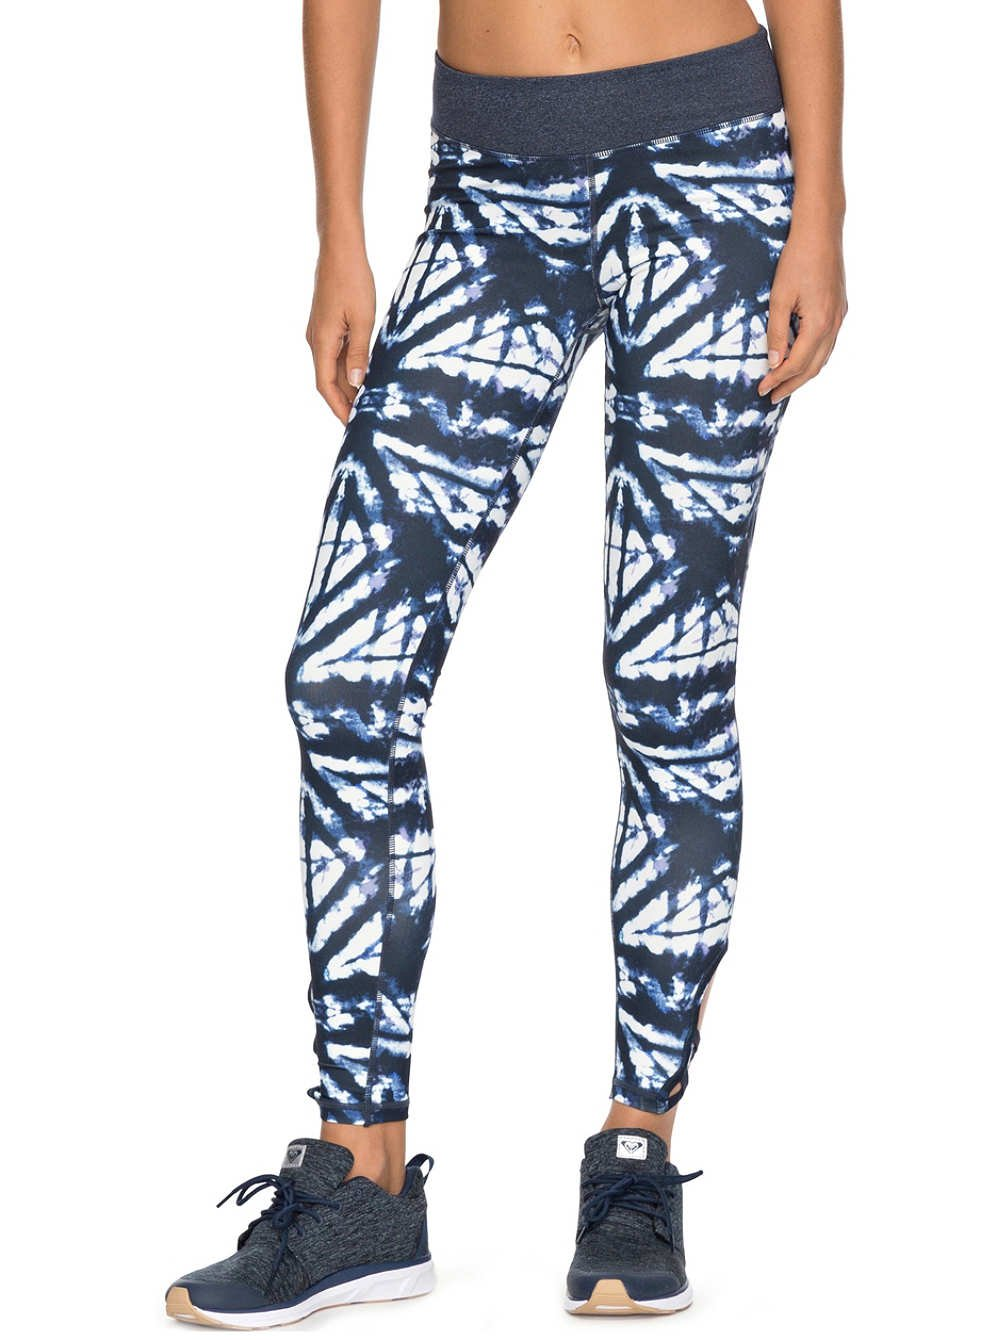 Roxy Ladies Natural Twist Leggings - Blue